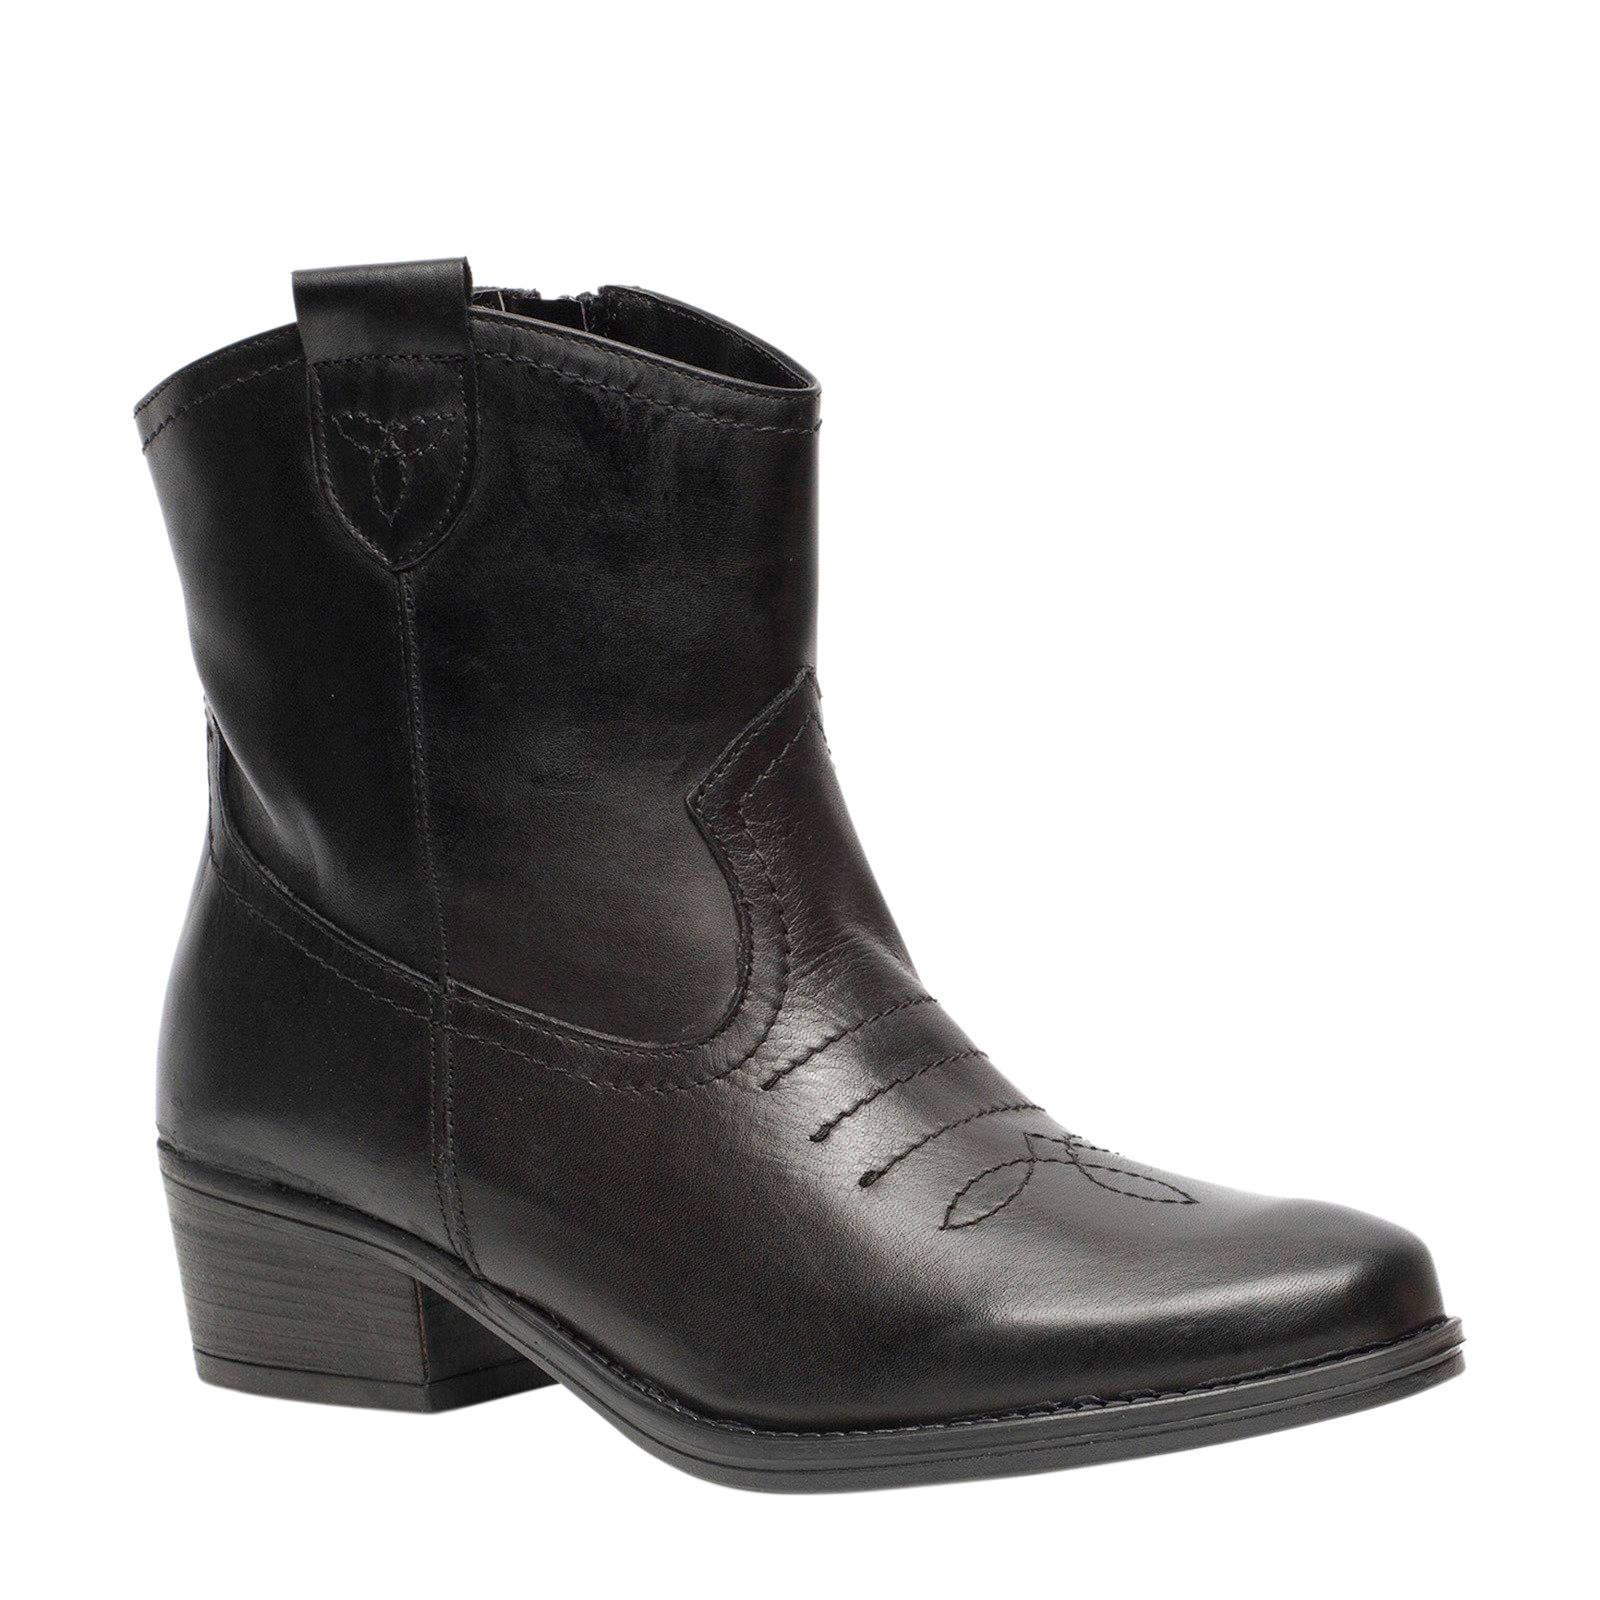 68374c60651 Dames boots bij wehkamp - Gratis bezorging vanaf 20.-